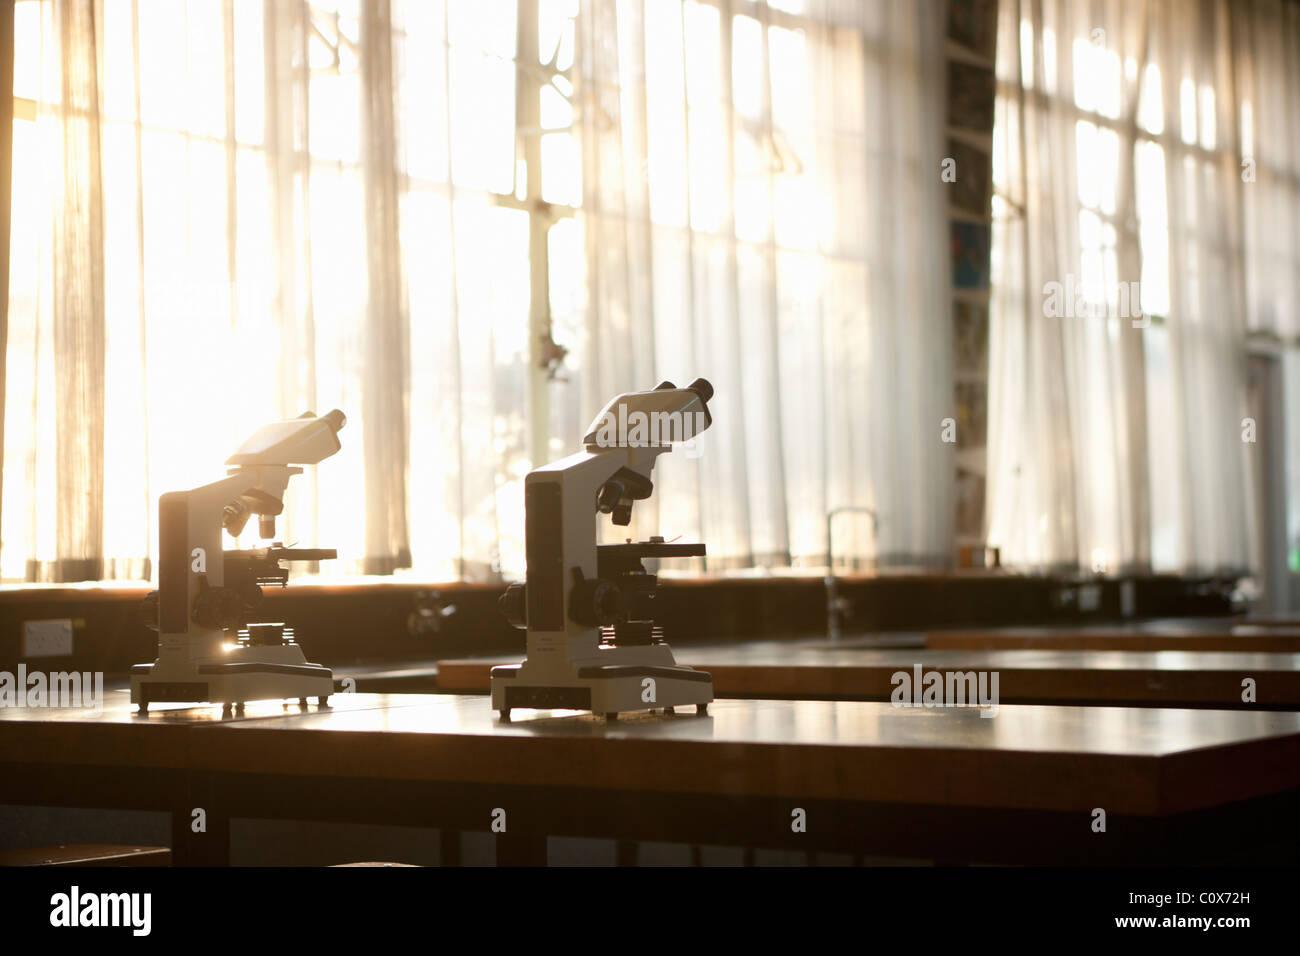 Dos micrpscopes en un banco Imagen De Stock